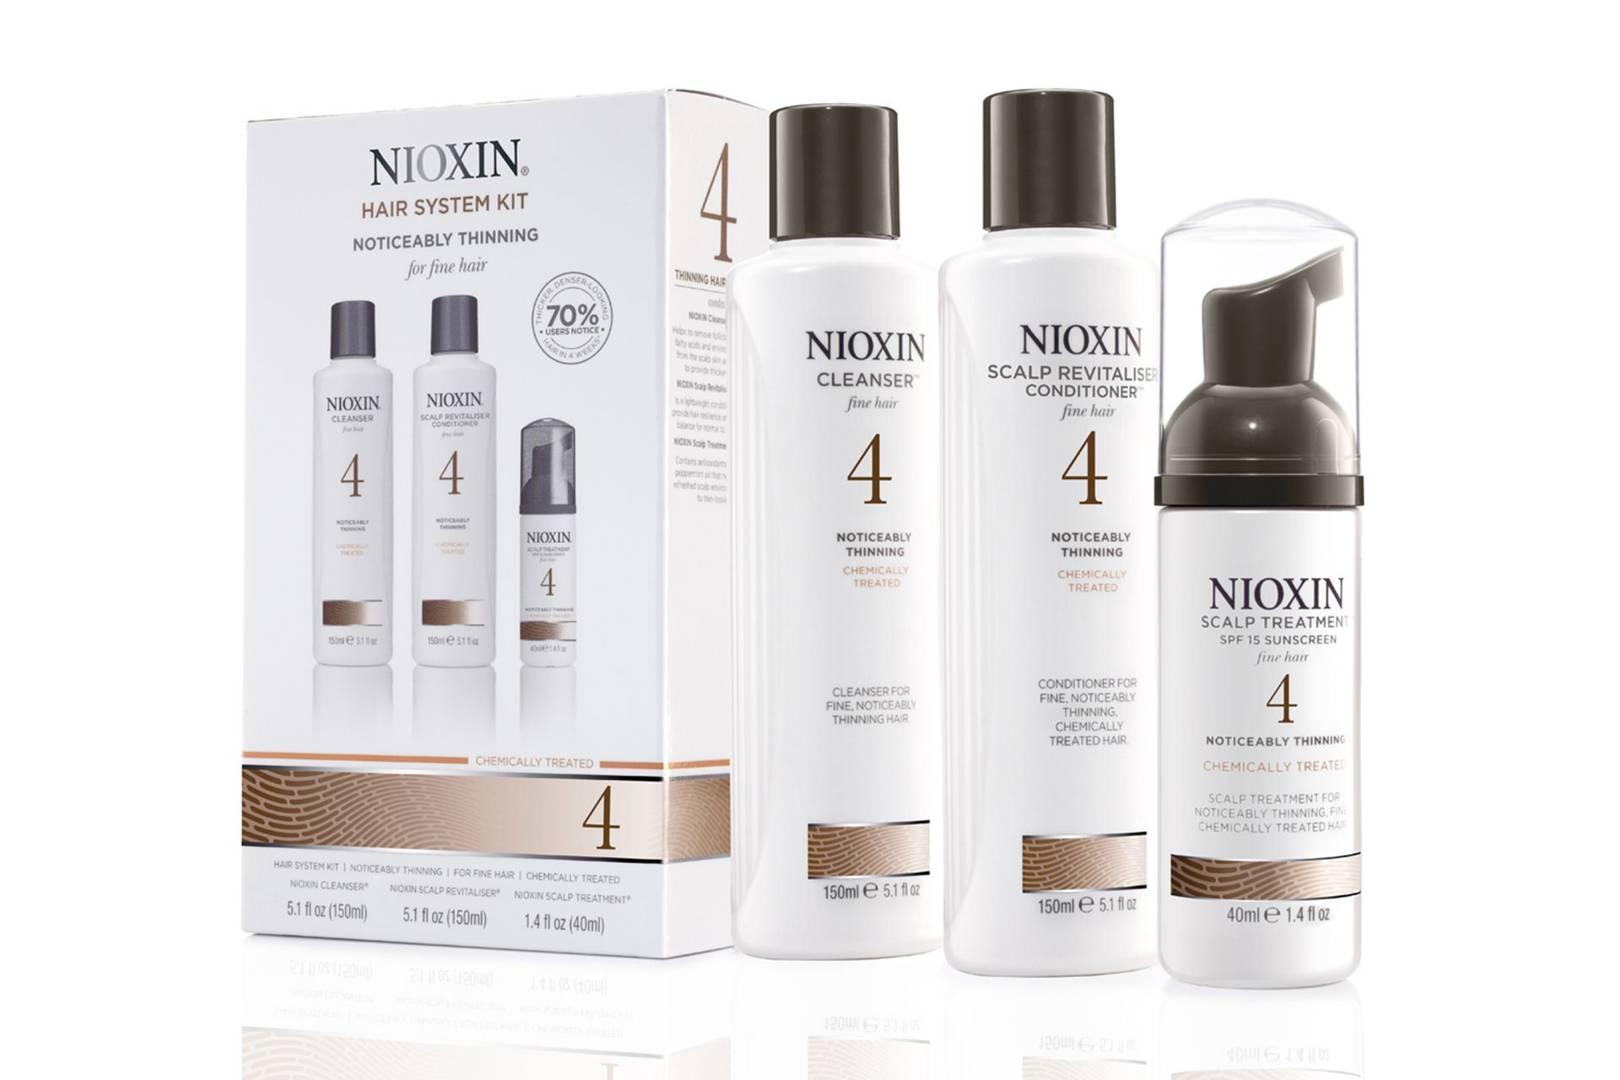 The Best Shampoo For Thin Fine Hair Aveda Kerastase Ogx